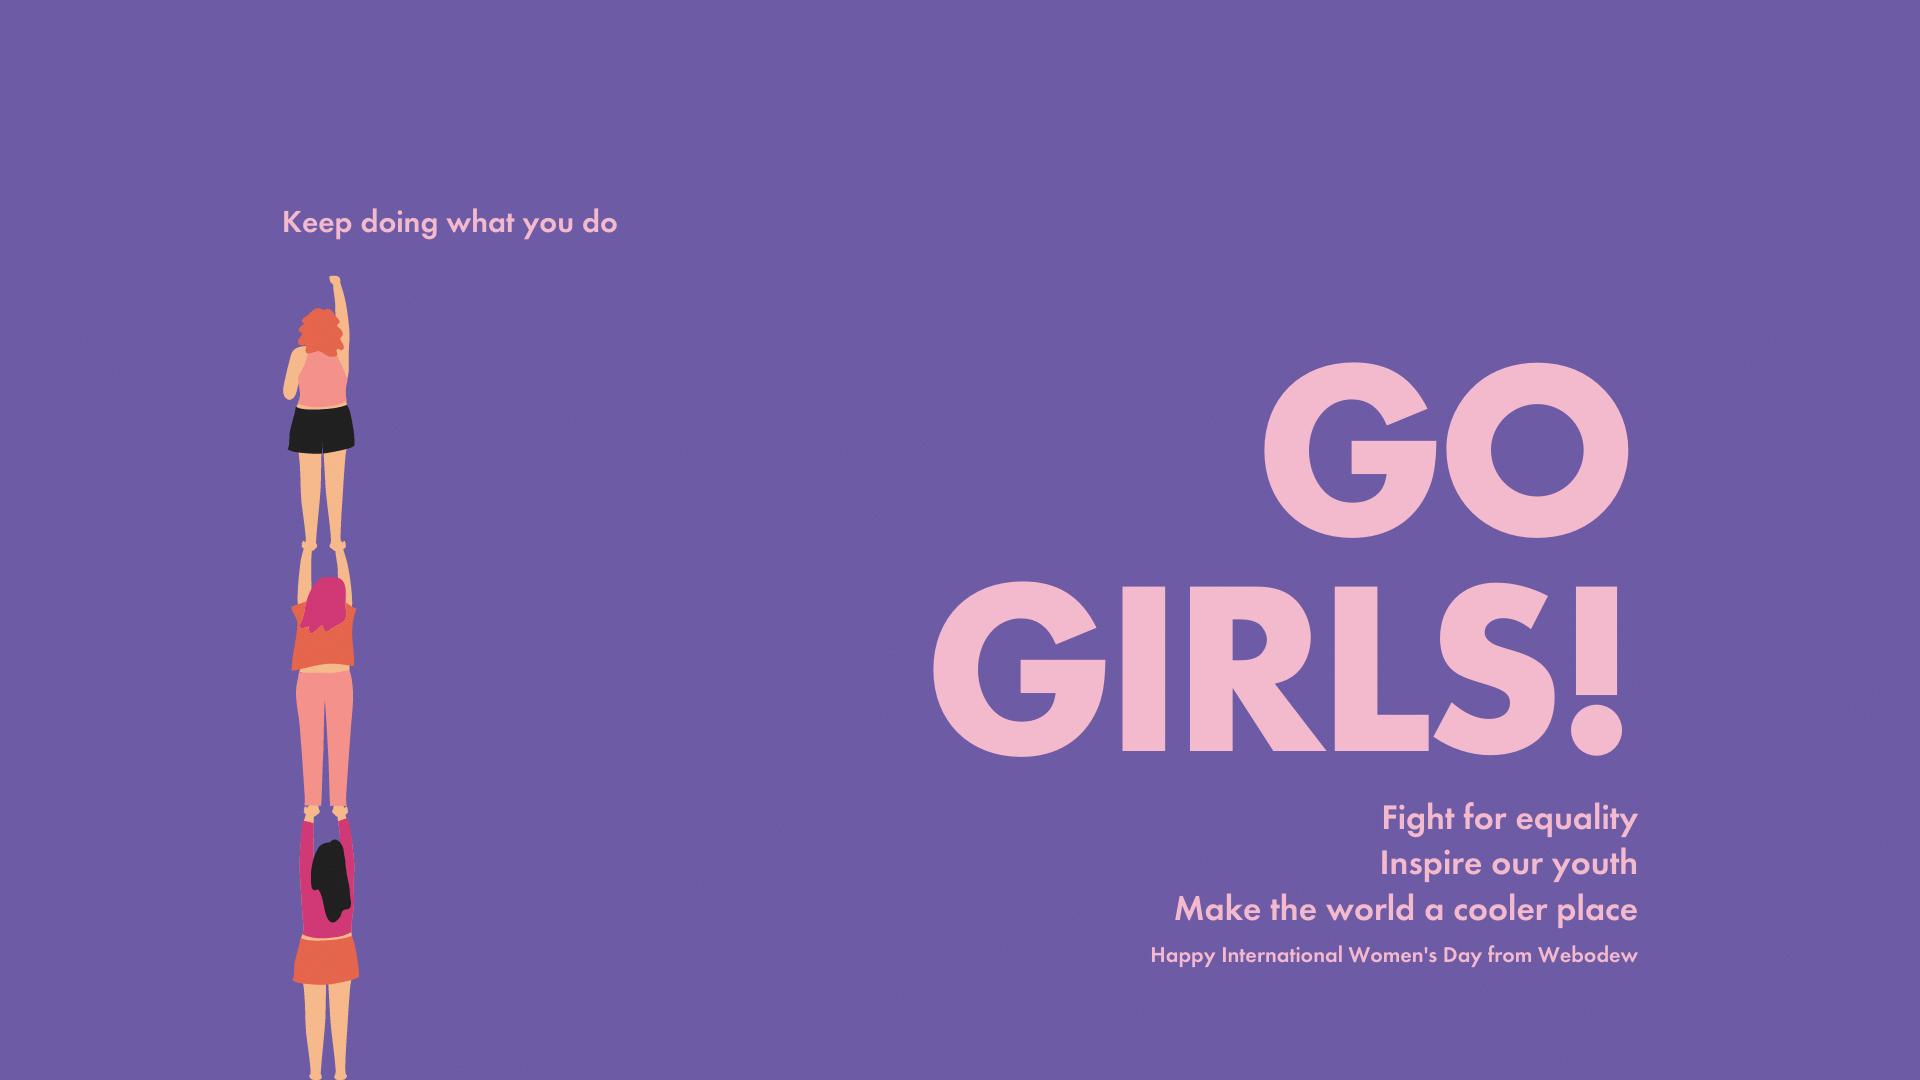 International Women's Day 2021 - Fight. Inspire. Cooler